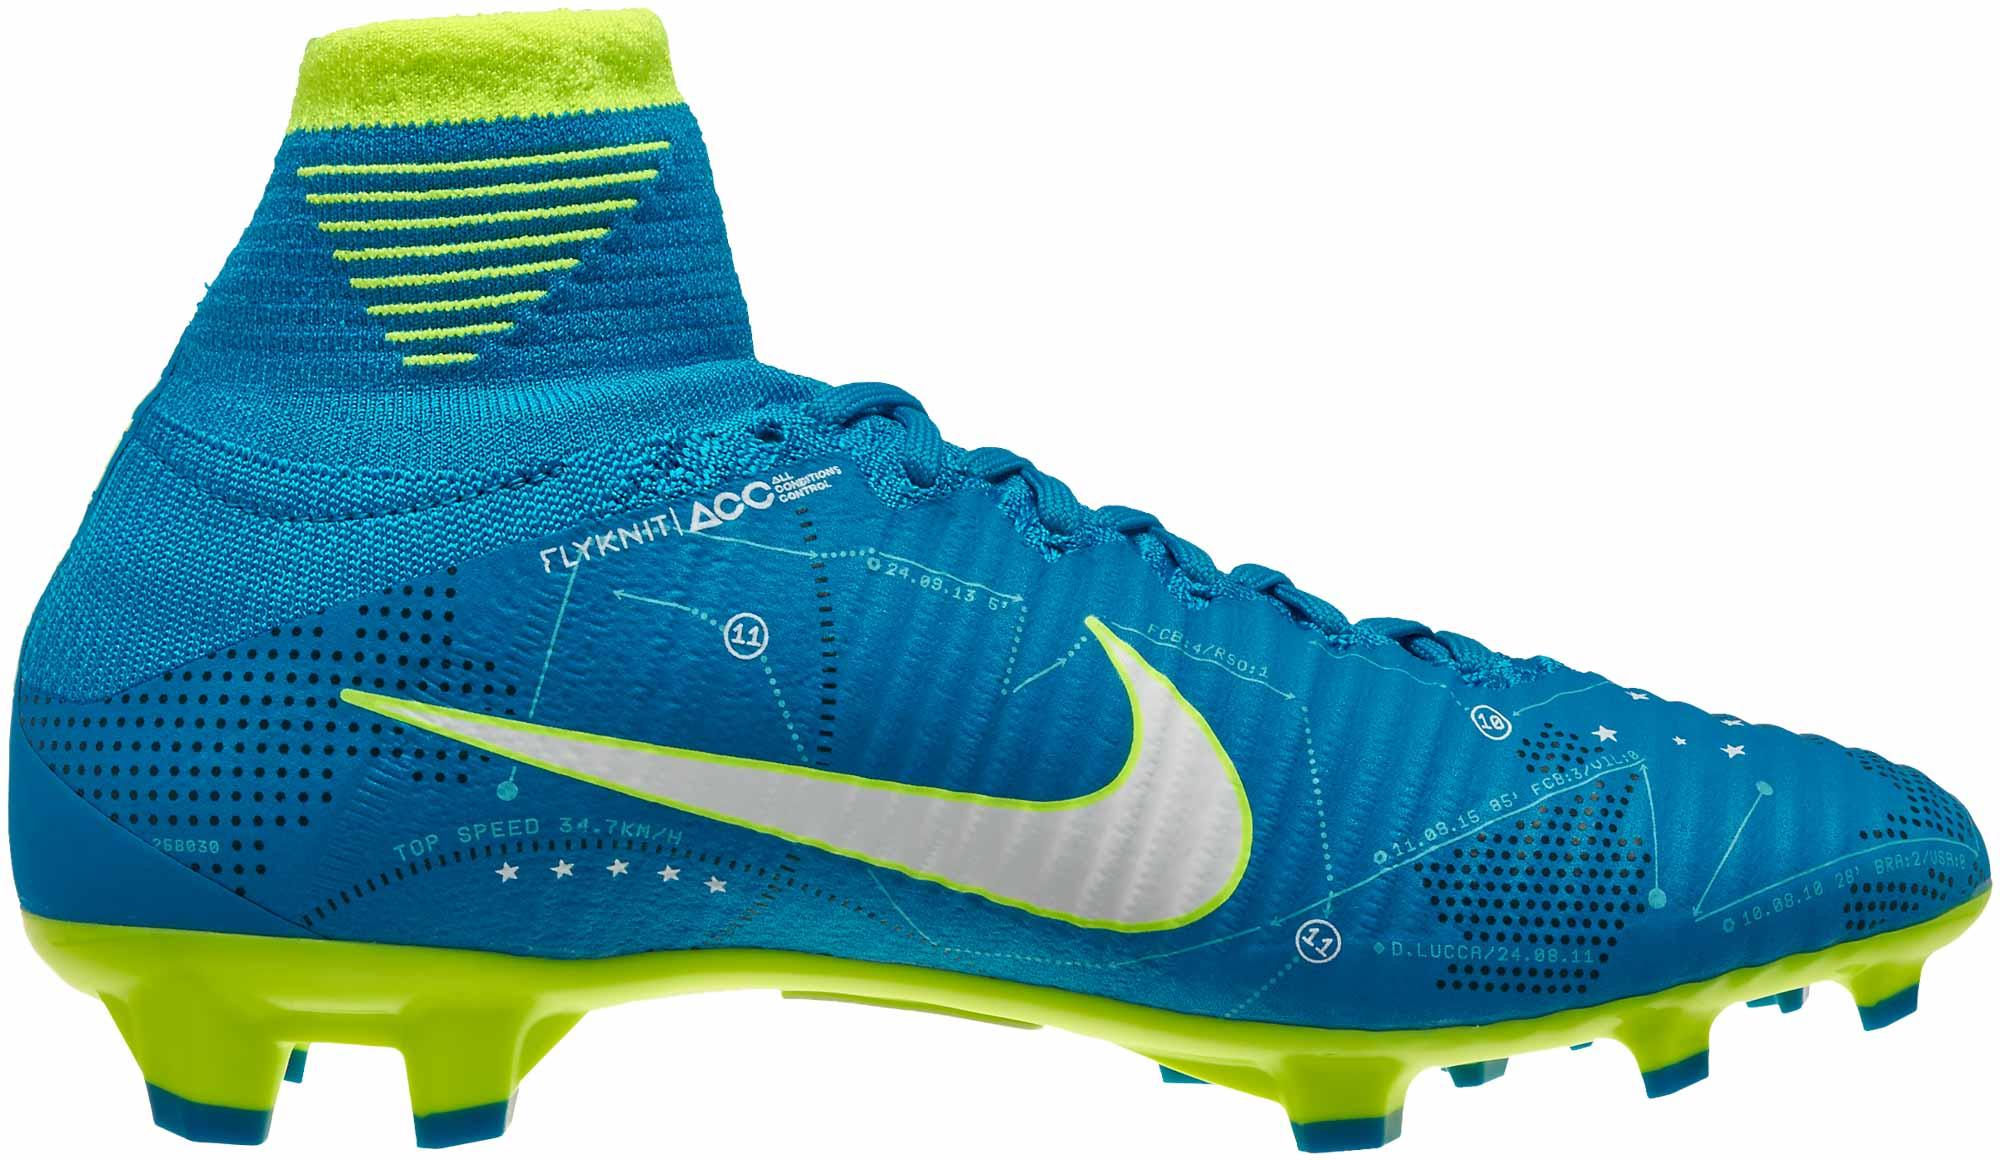 9f0b599a9 Nike Kids Mercurial Superfly V FG - Neymar - Blue Orbit   White ...